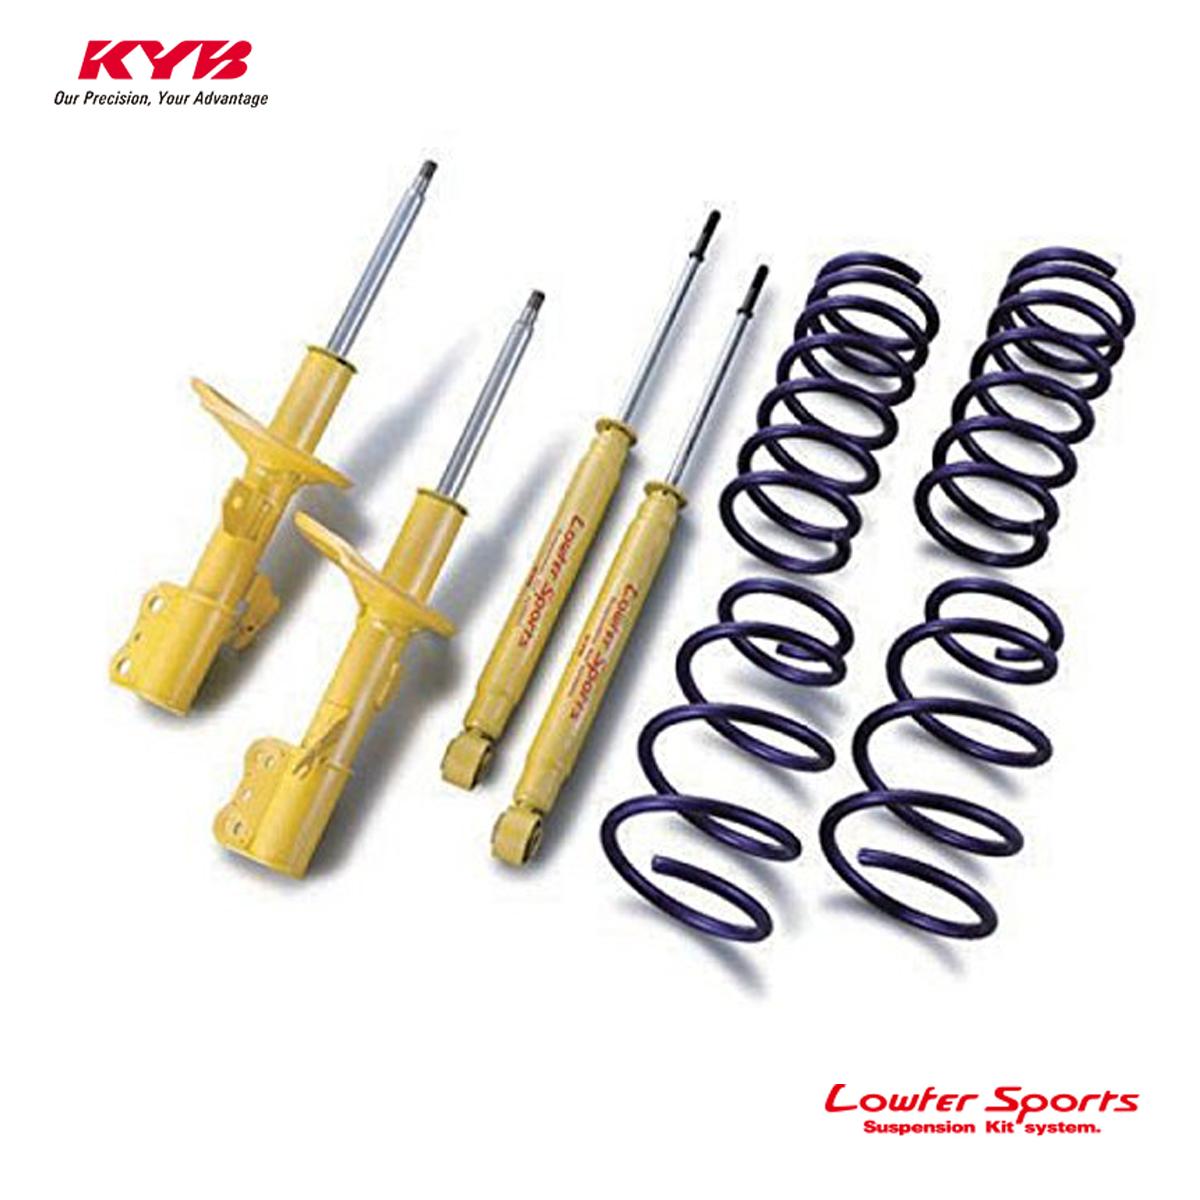 KYB カヤバ セレナ NC26 ショックアブソーバー サスペンションキット 1台分 ローファースポーツ キット Lowfer Sports LKIT-NC26